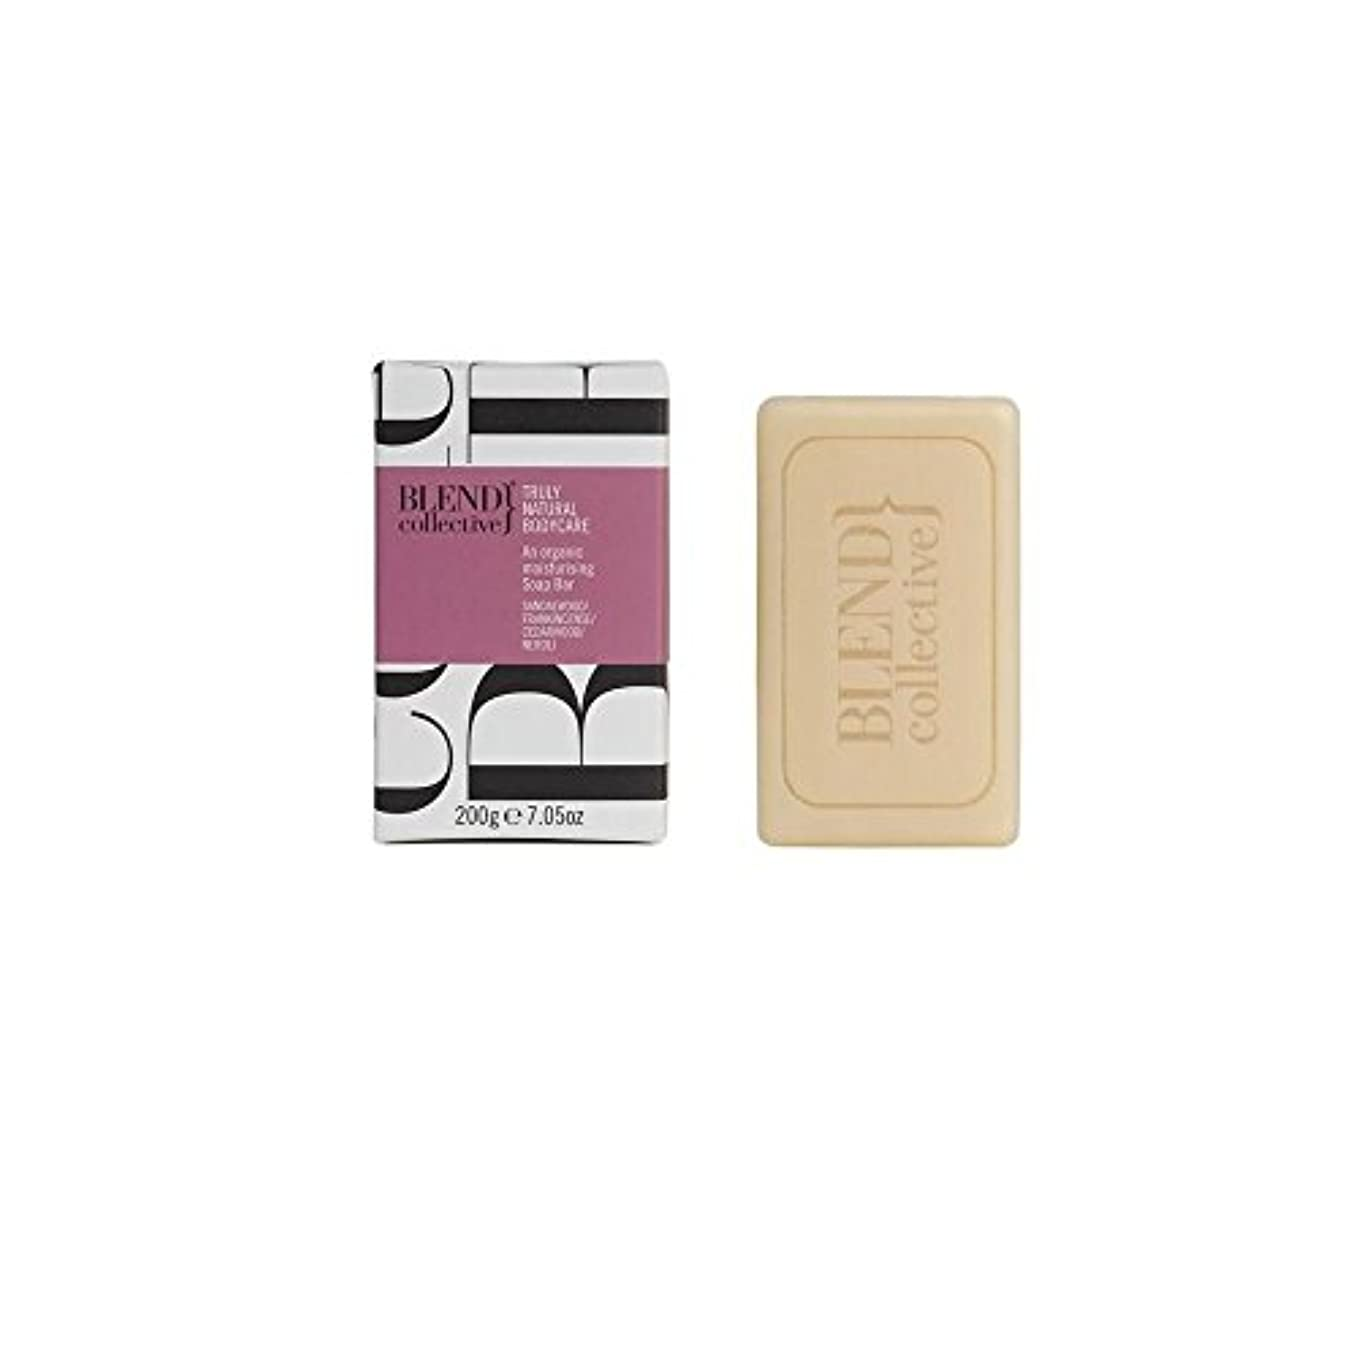 Blend Collective Unwinding Soap Bar (200g) 集合的な巻き戻し固形石鹸( 200グラム)をブレンド [並行輸入品]